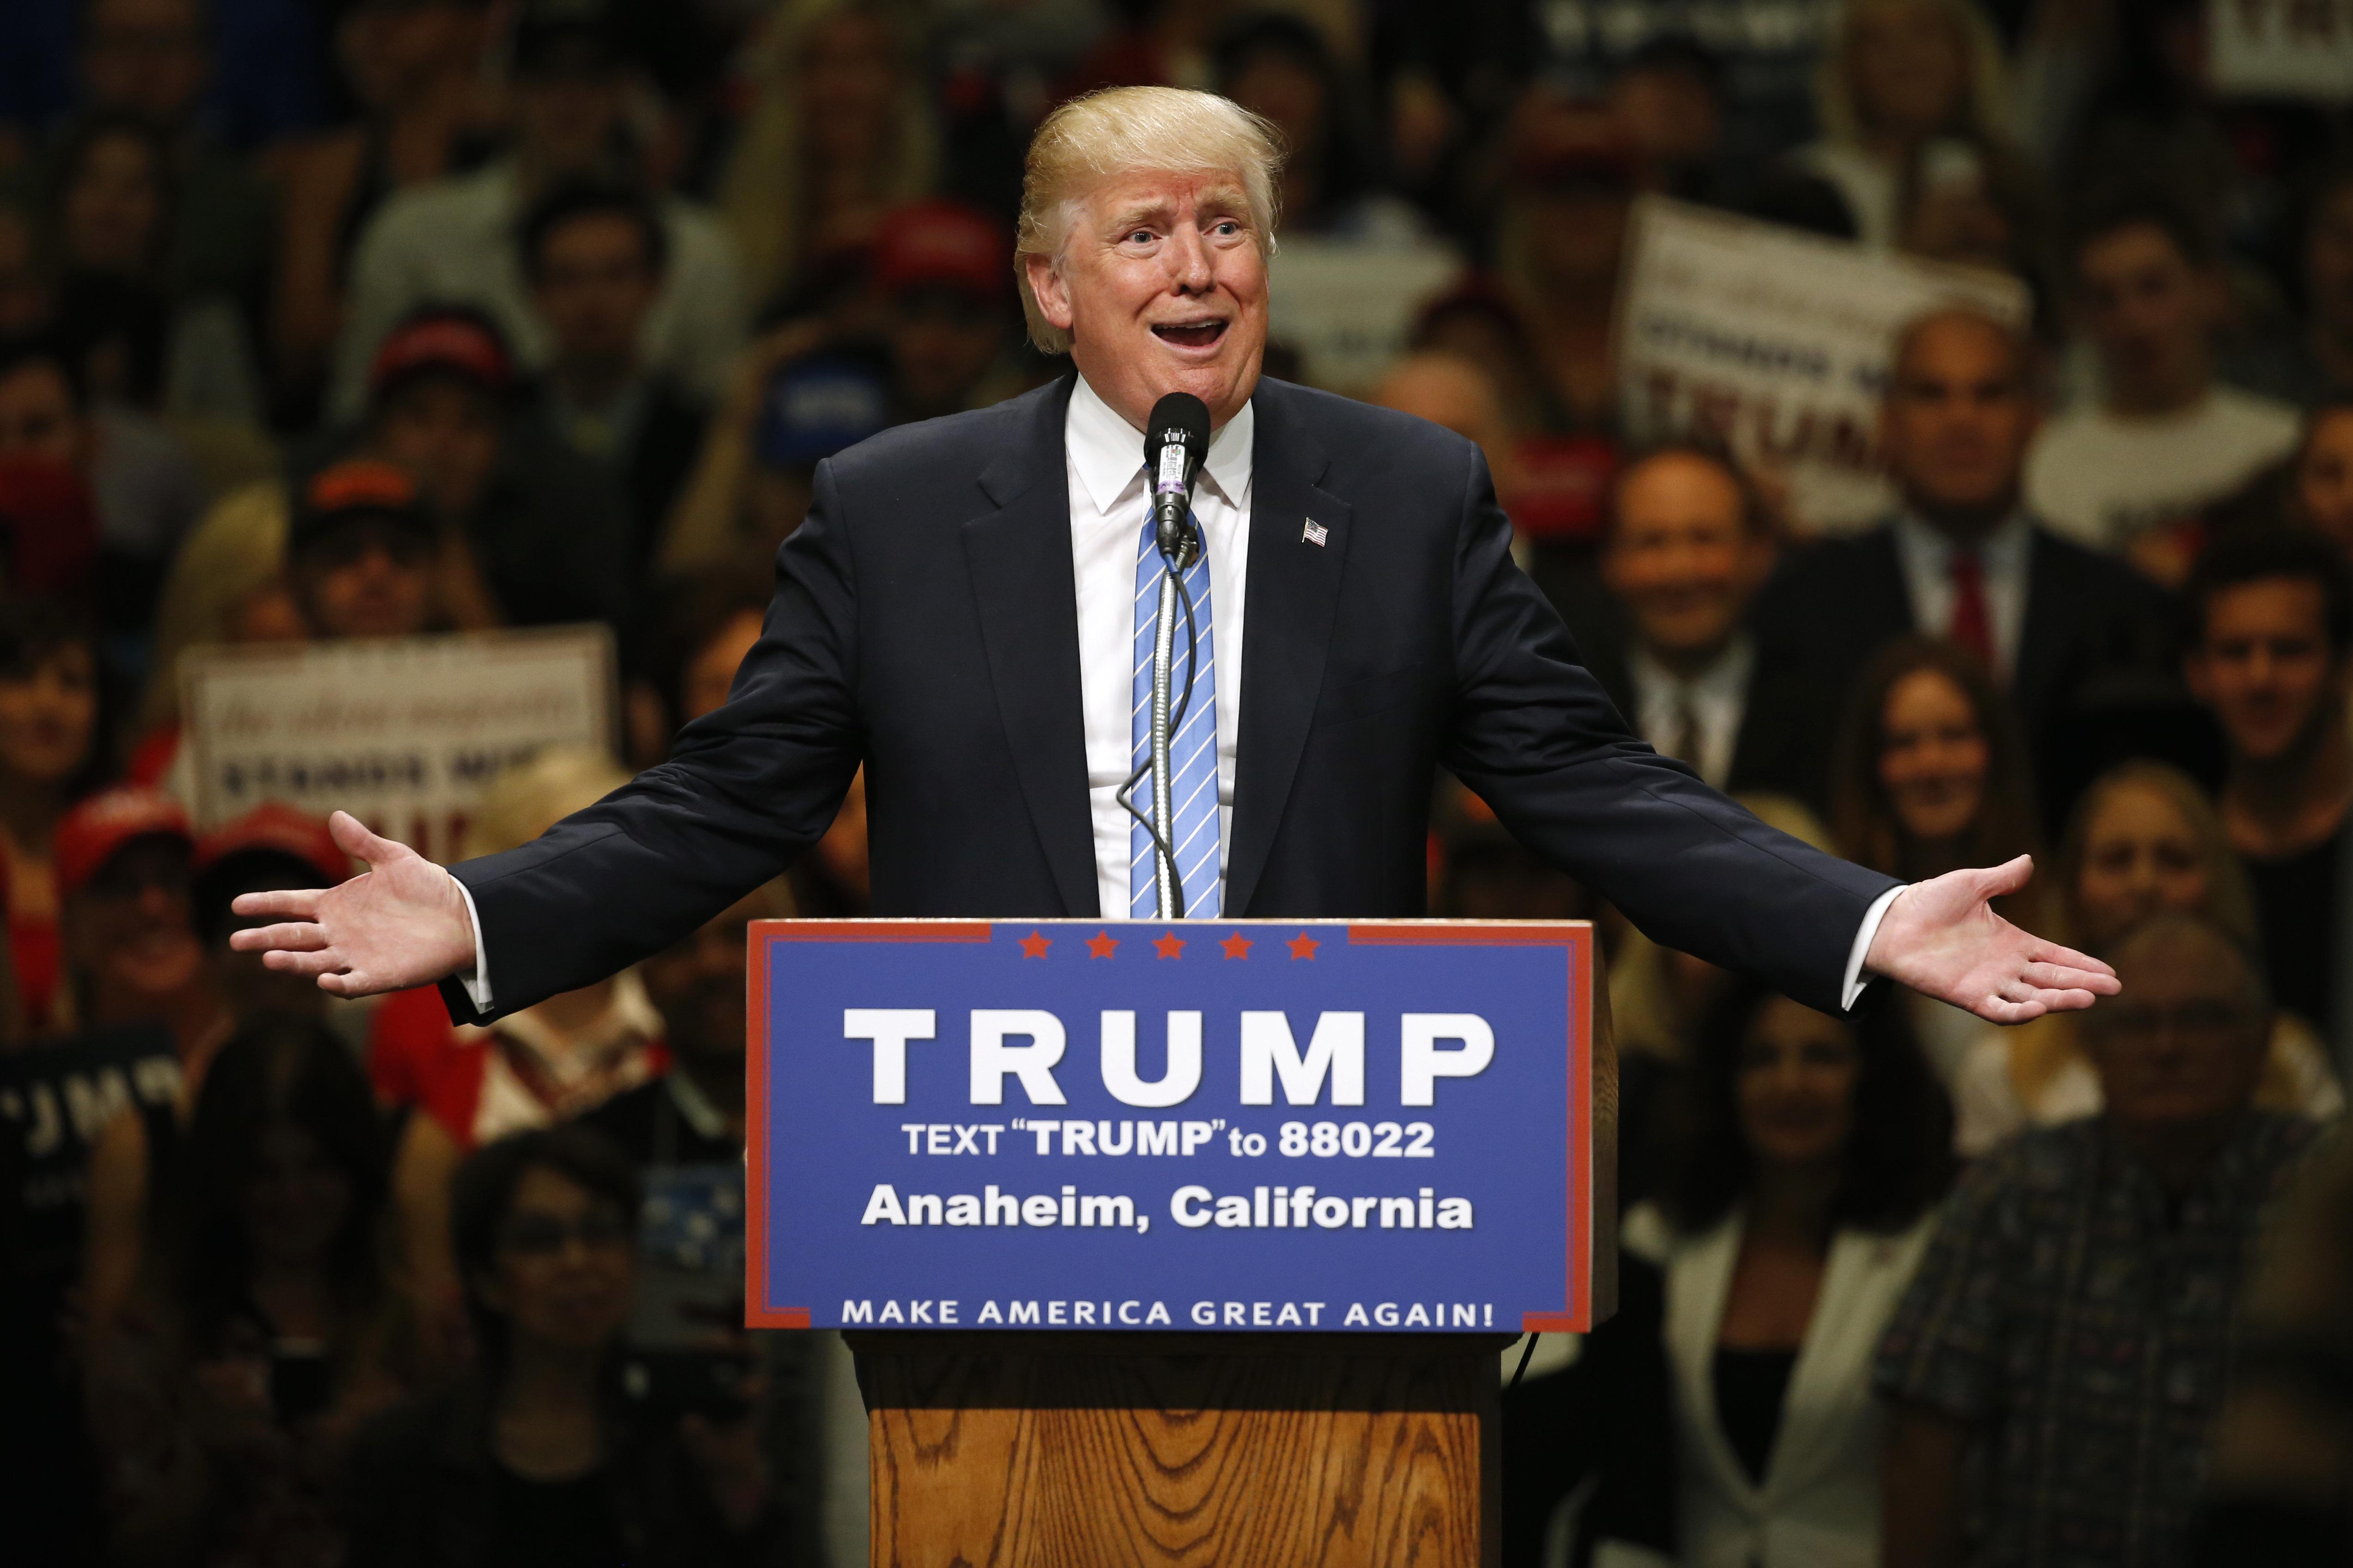 At a campaign event today in Anaheim, California, presumptiveRepublican presidential nominee Donald Trump bragged again